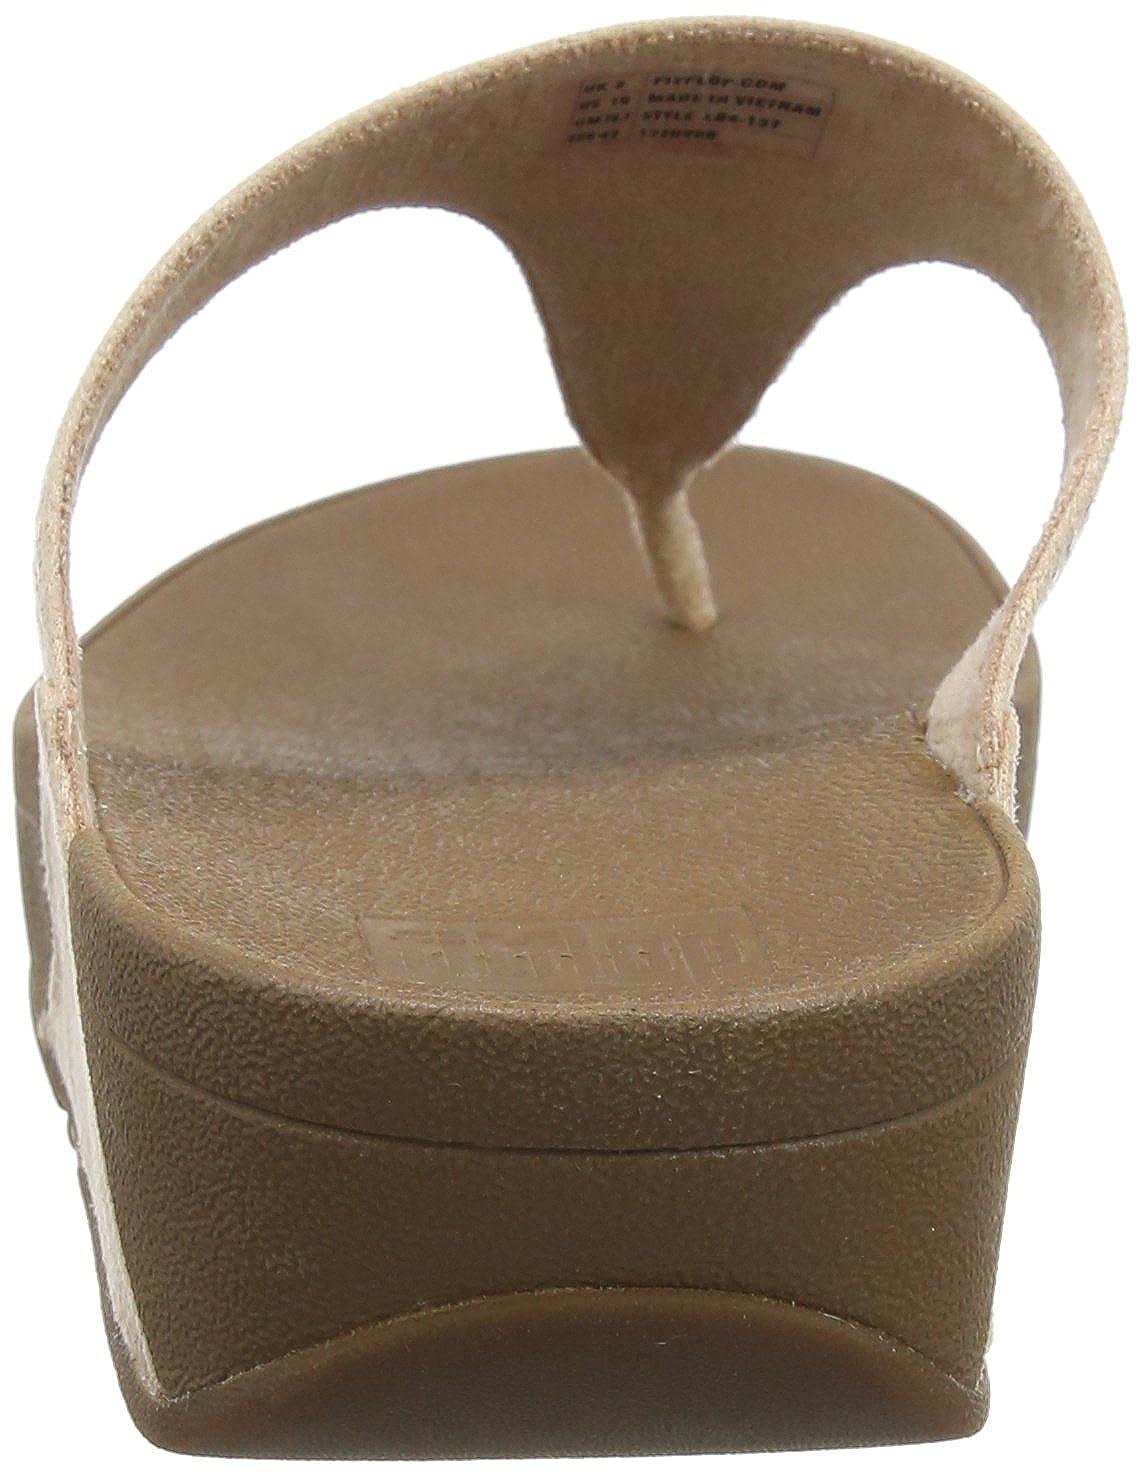 FitFlop Incastone Damen Incastone FitFlop Toe-Thong Sandalen Beige (Nude 137) c27faa